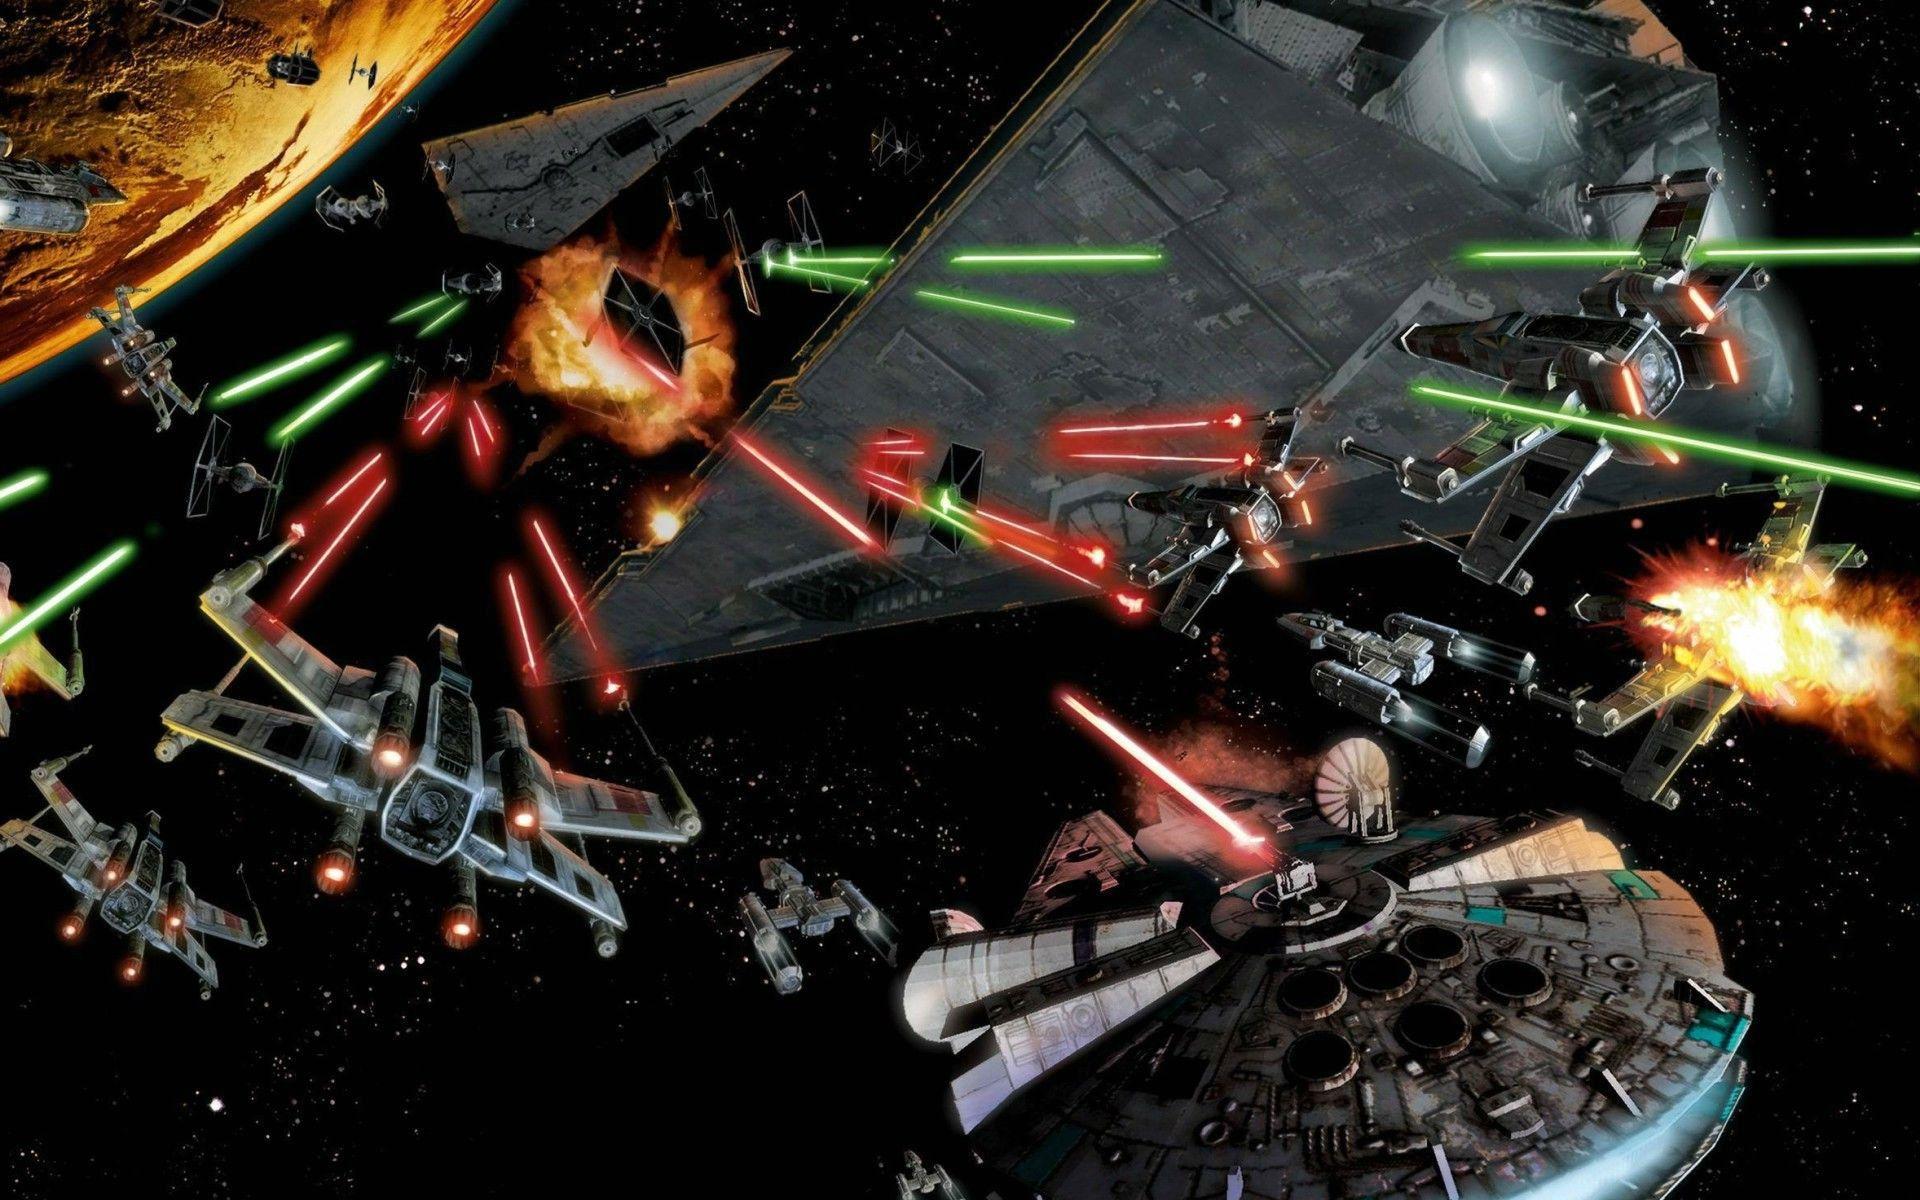 King Size ×Inch Star Wars Millennium Falcon Blanket 1920×1200 Millenium Falcon Backgrounds (. Live WallpapersWallpaper ...